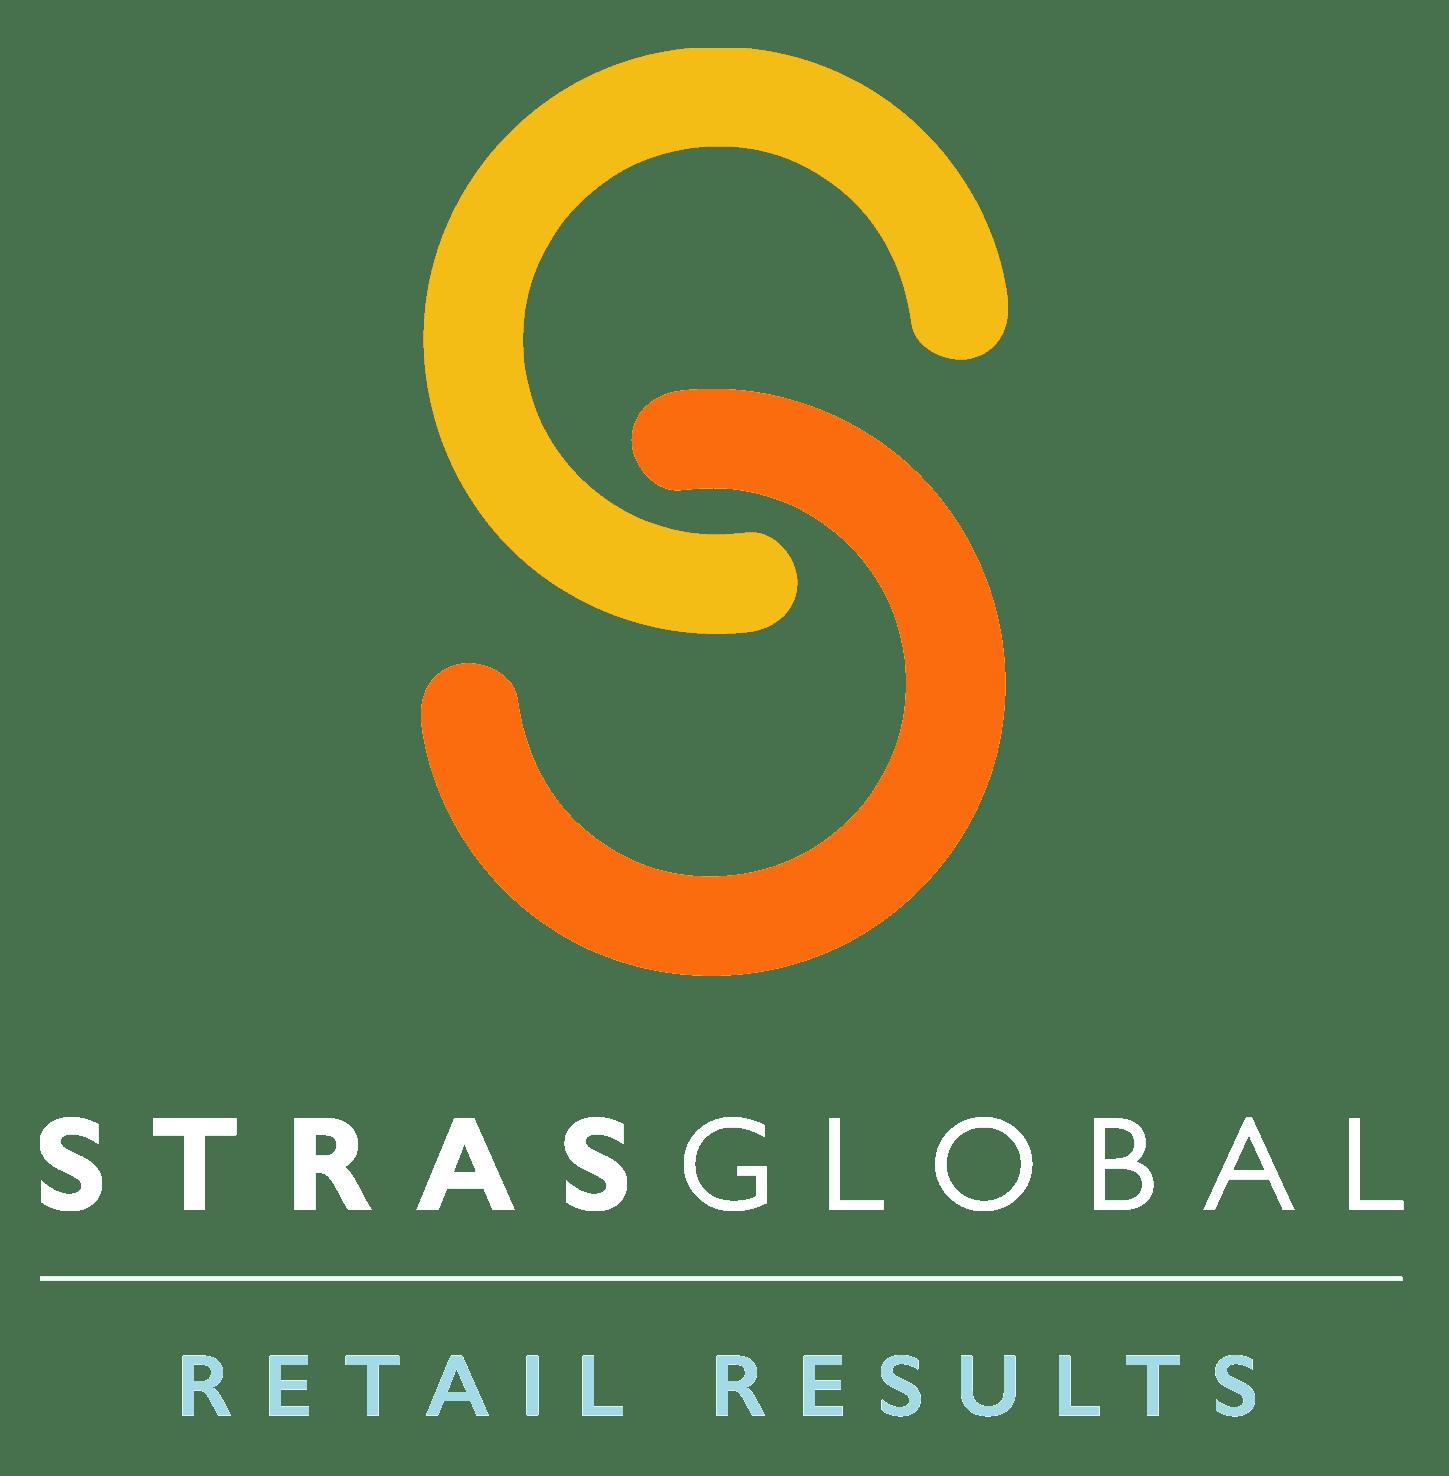 StrasGlobal